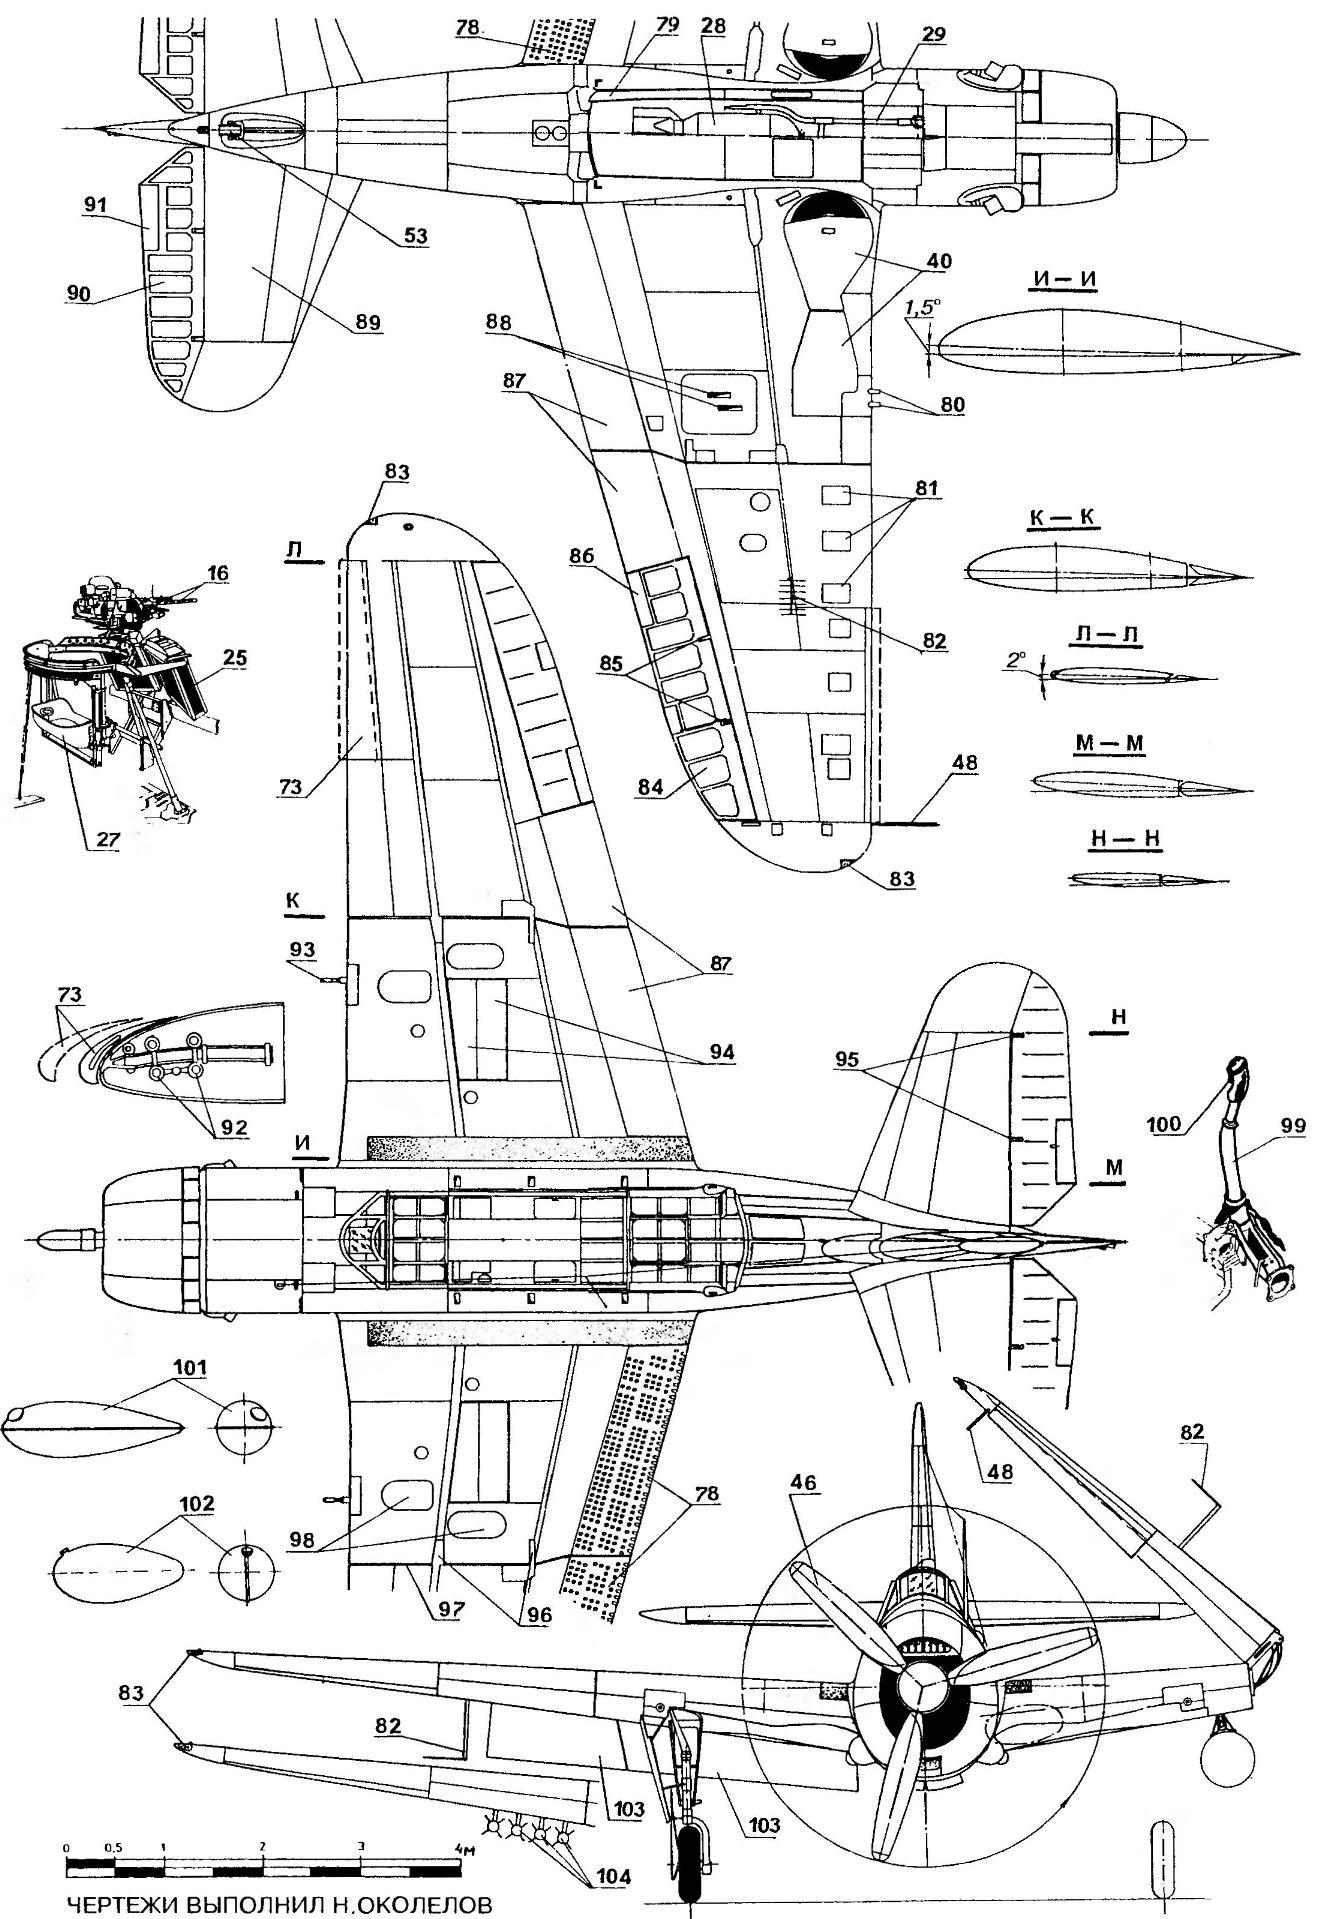 Палубный разведчик-бомбардировщик Curtiss SB2C HELLDIVER